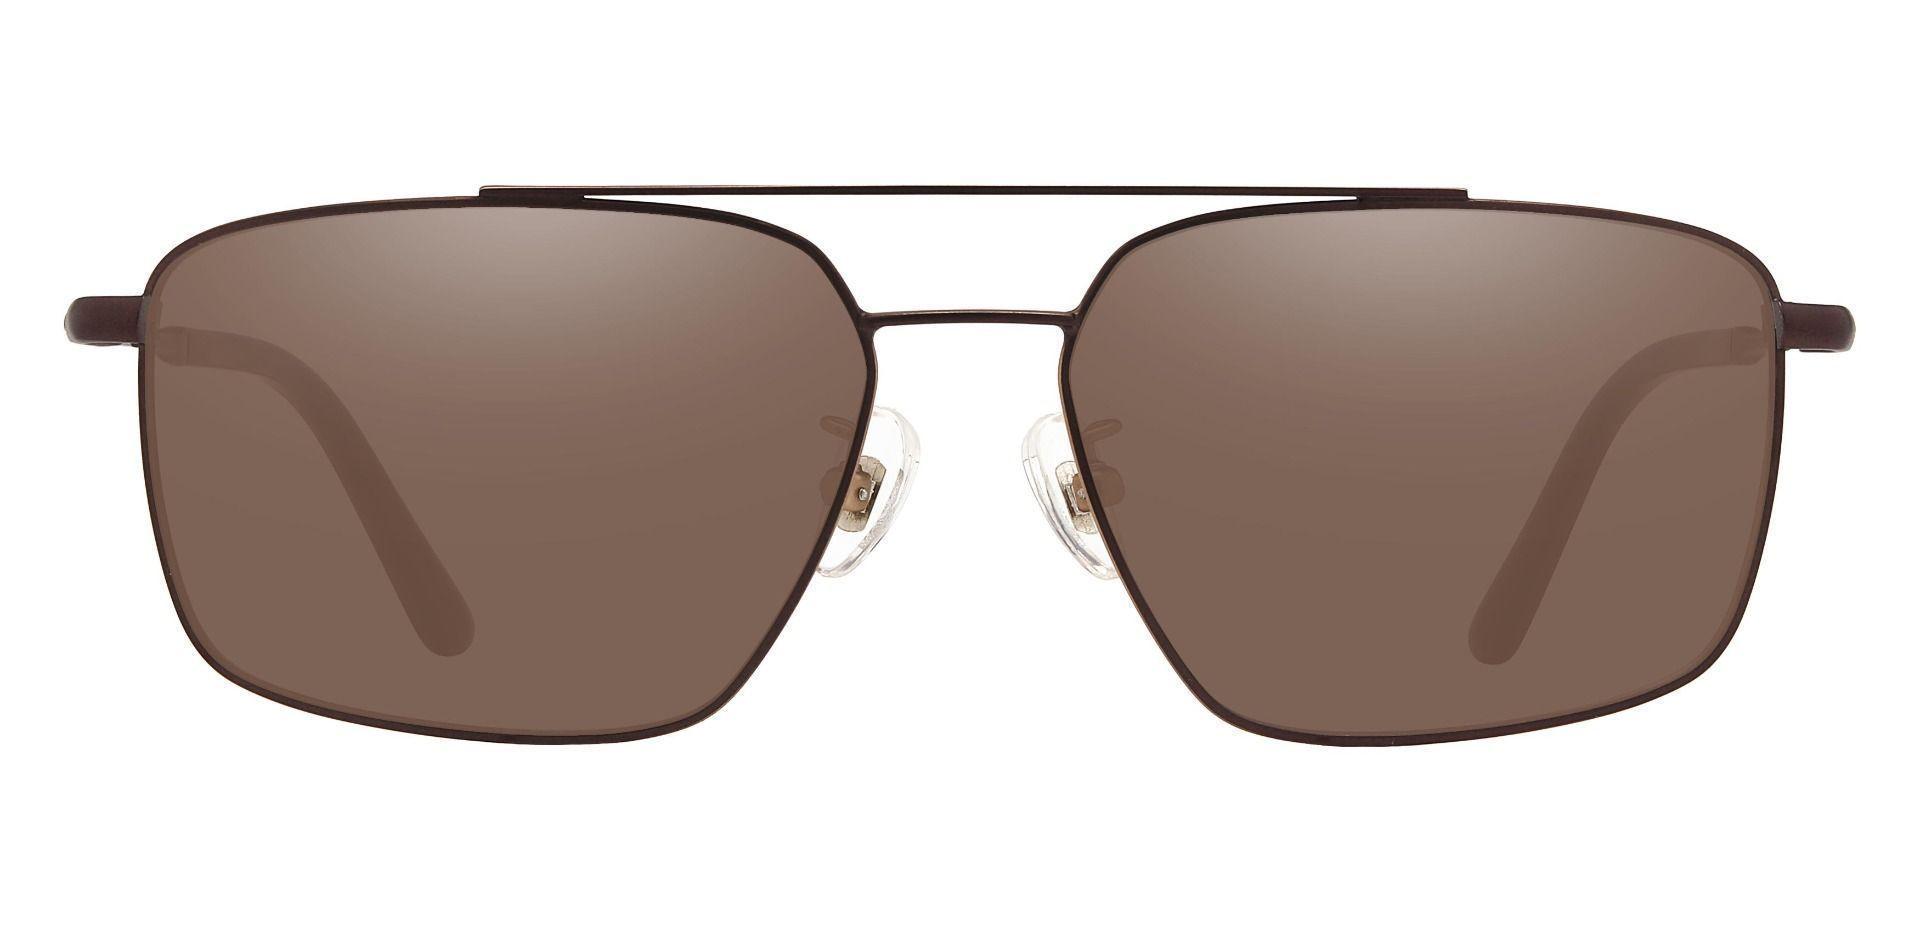 Barlow Aviator Prescription Sunglasses - Brown Frame With Brown Lenses